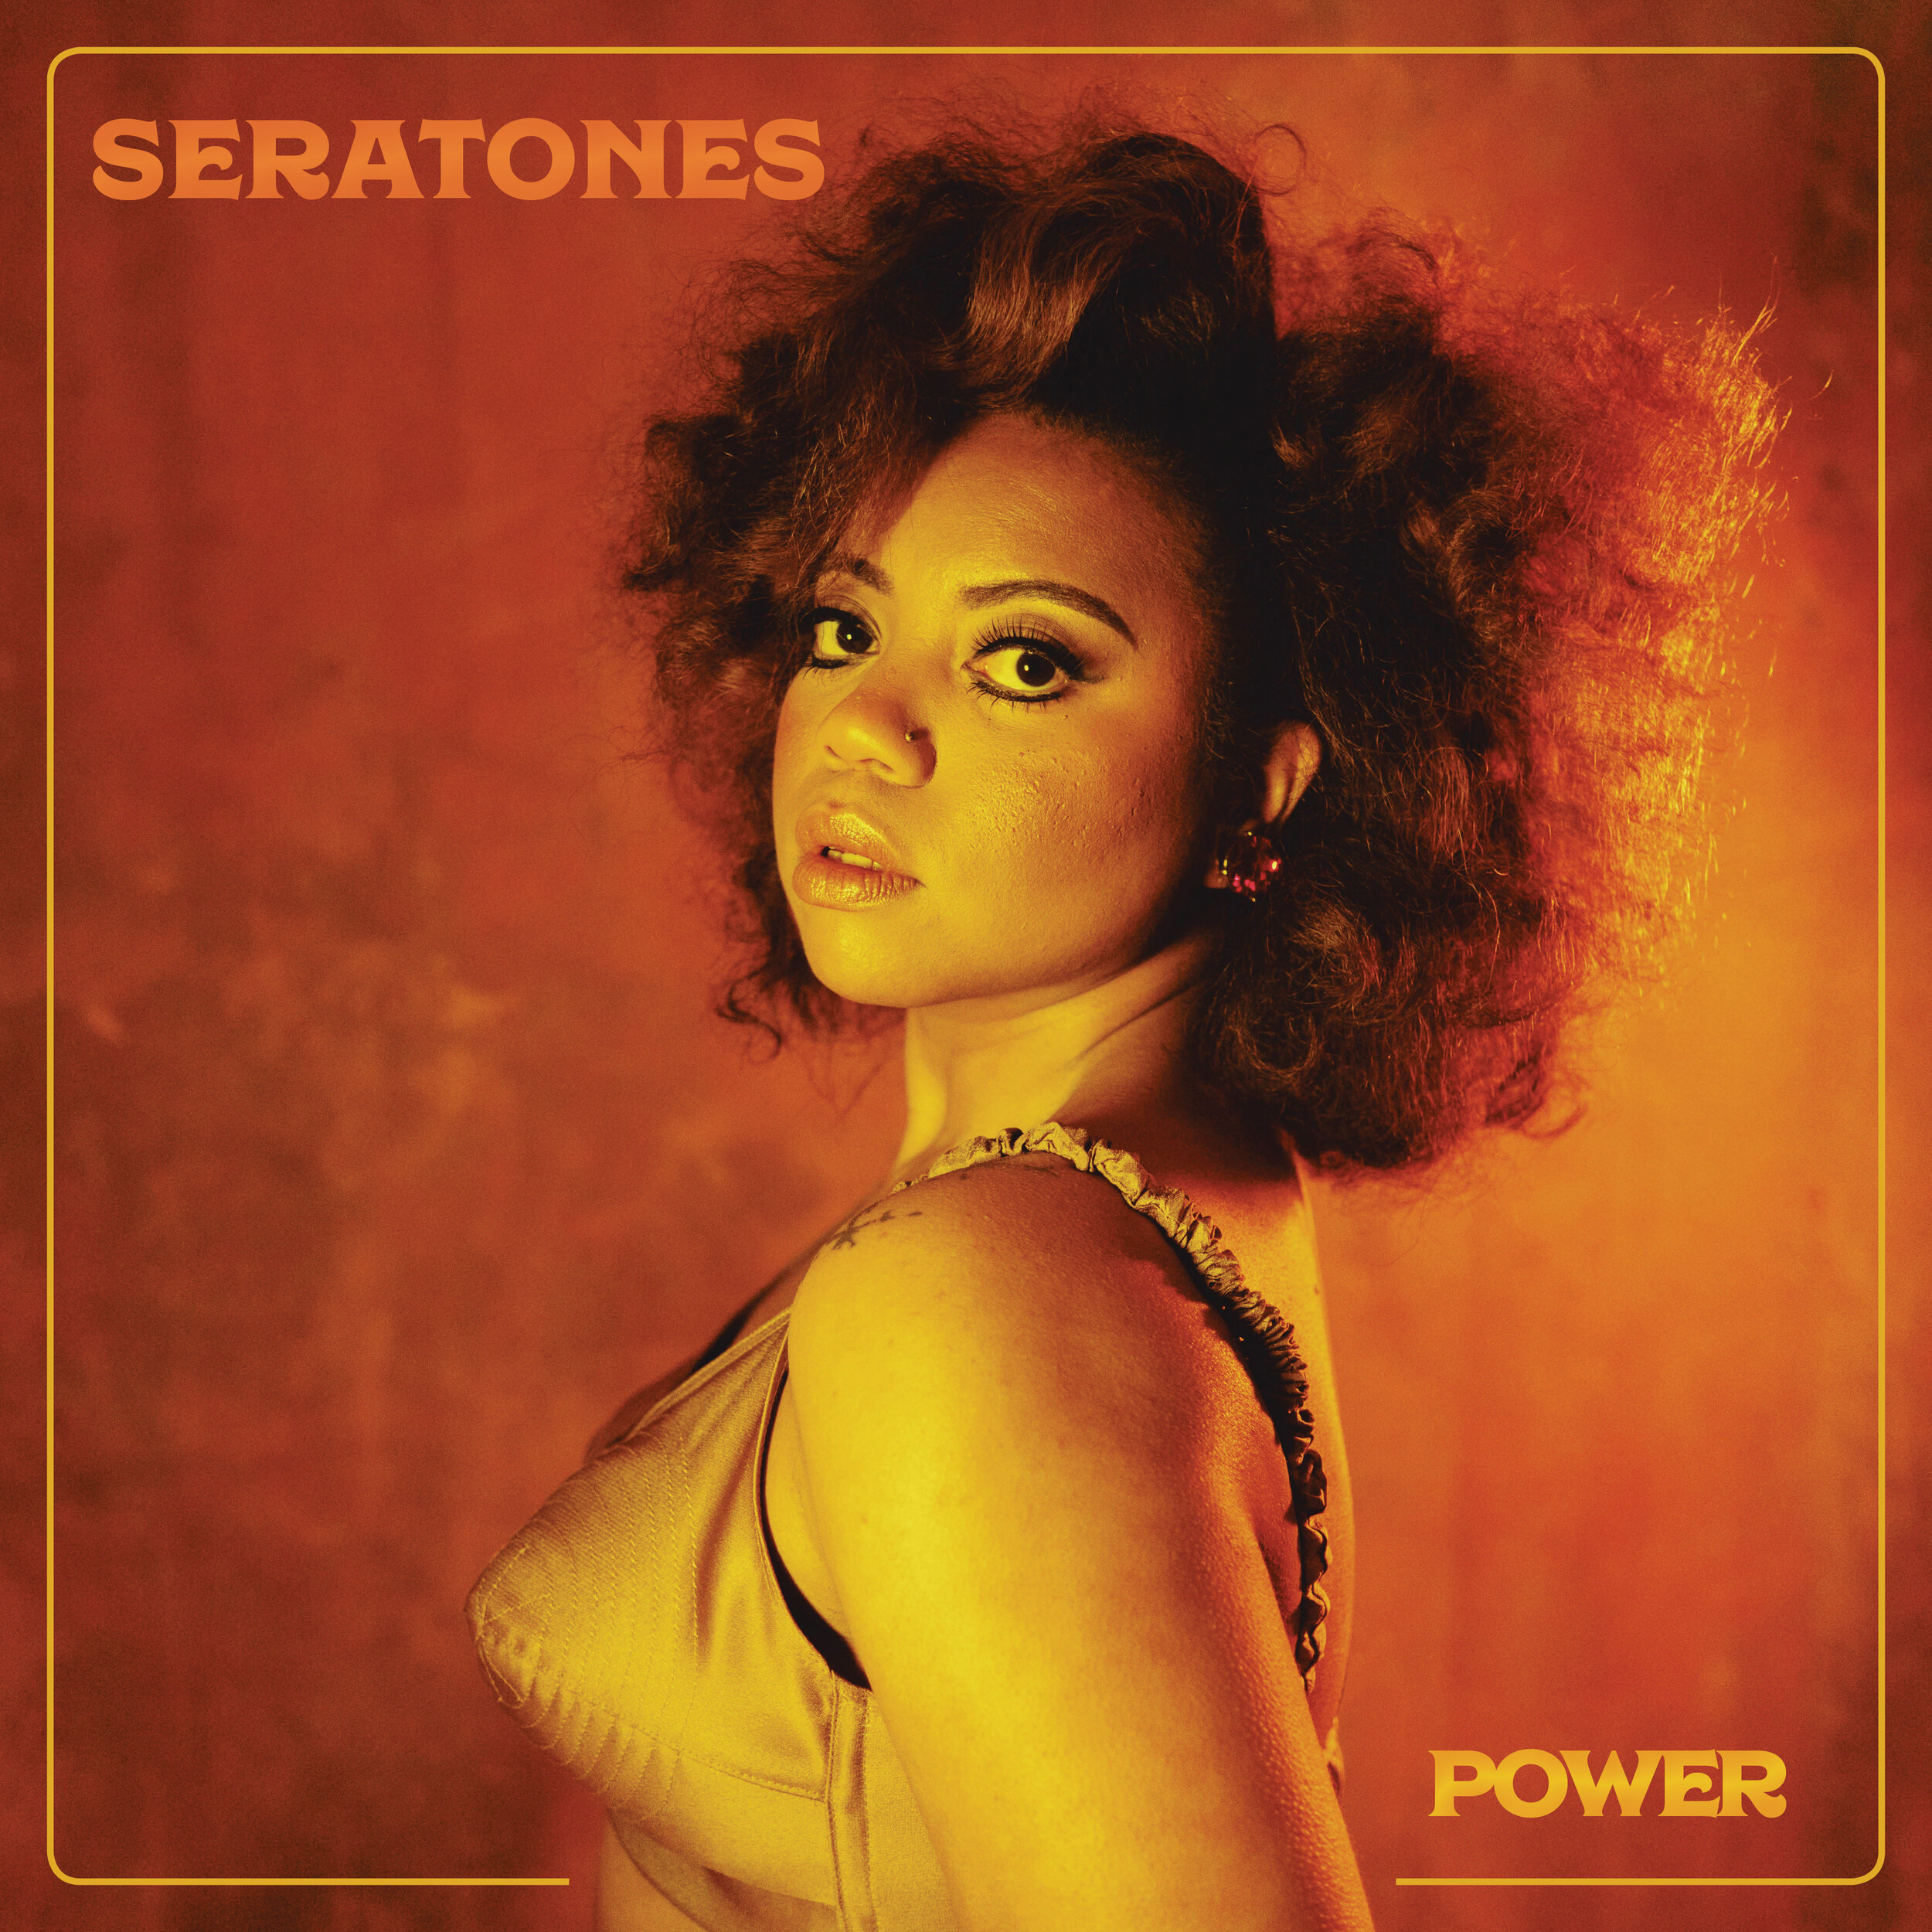 Seratones - Power - Album Art.jpg